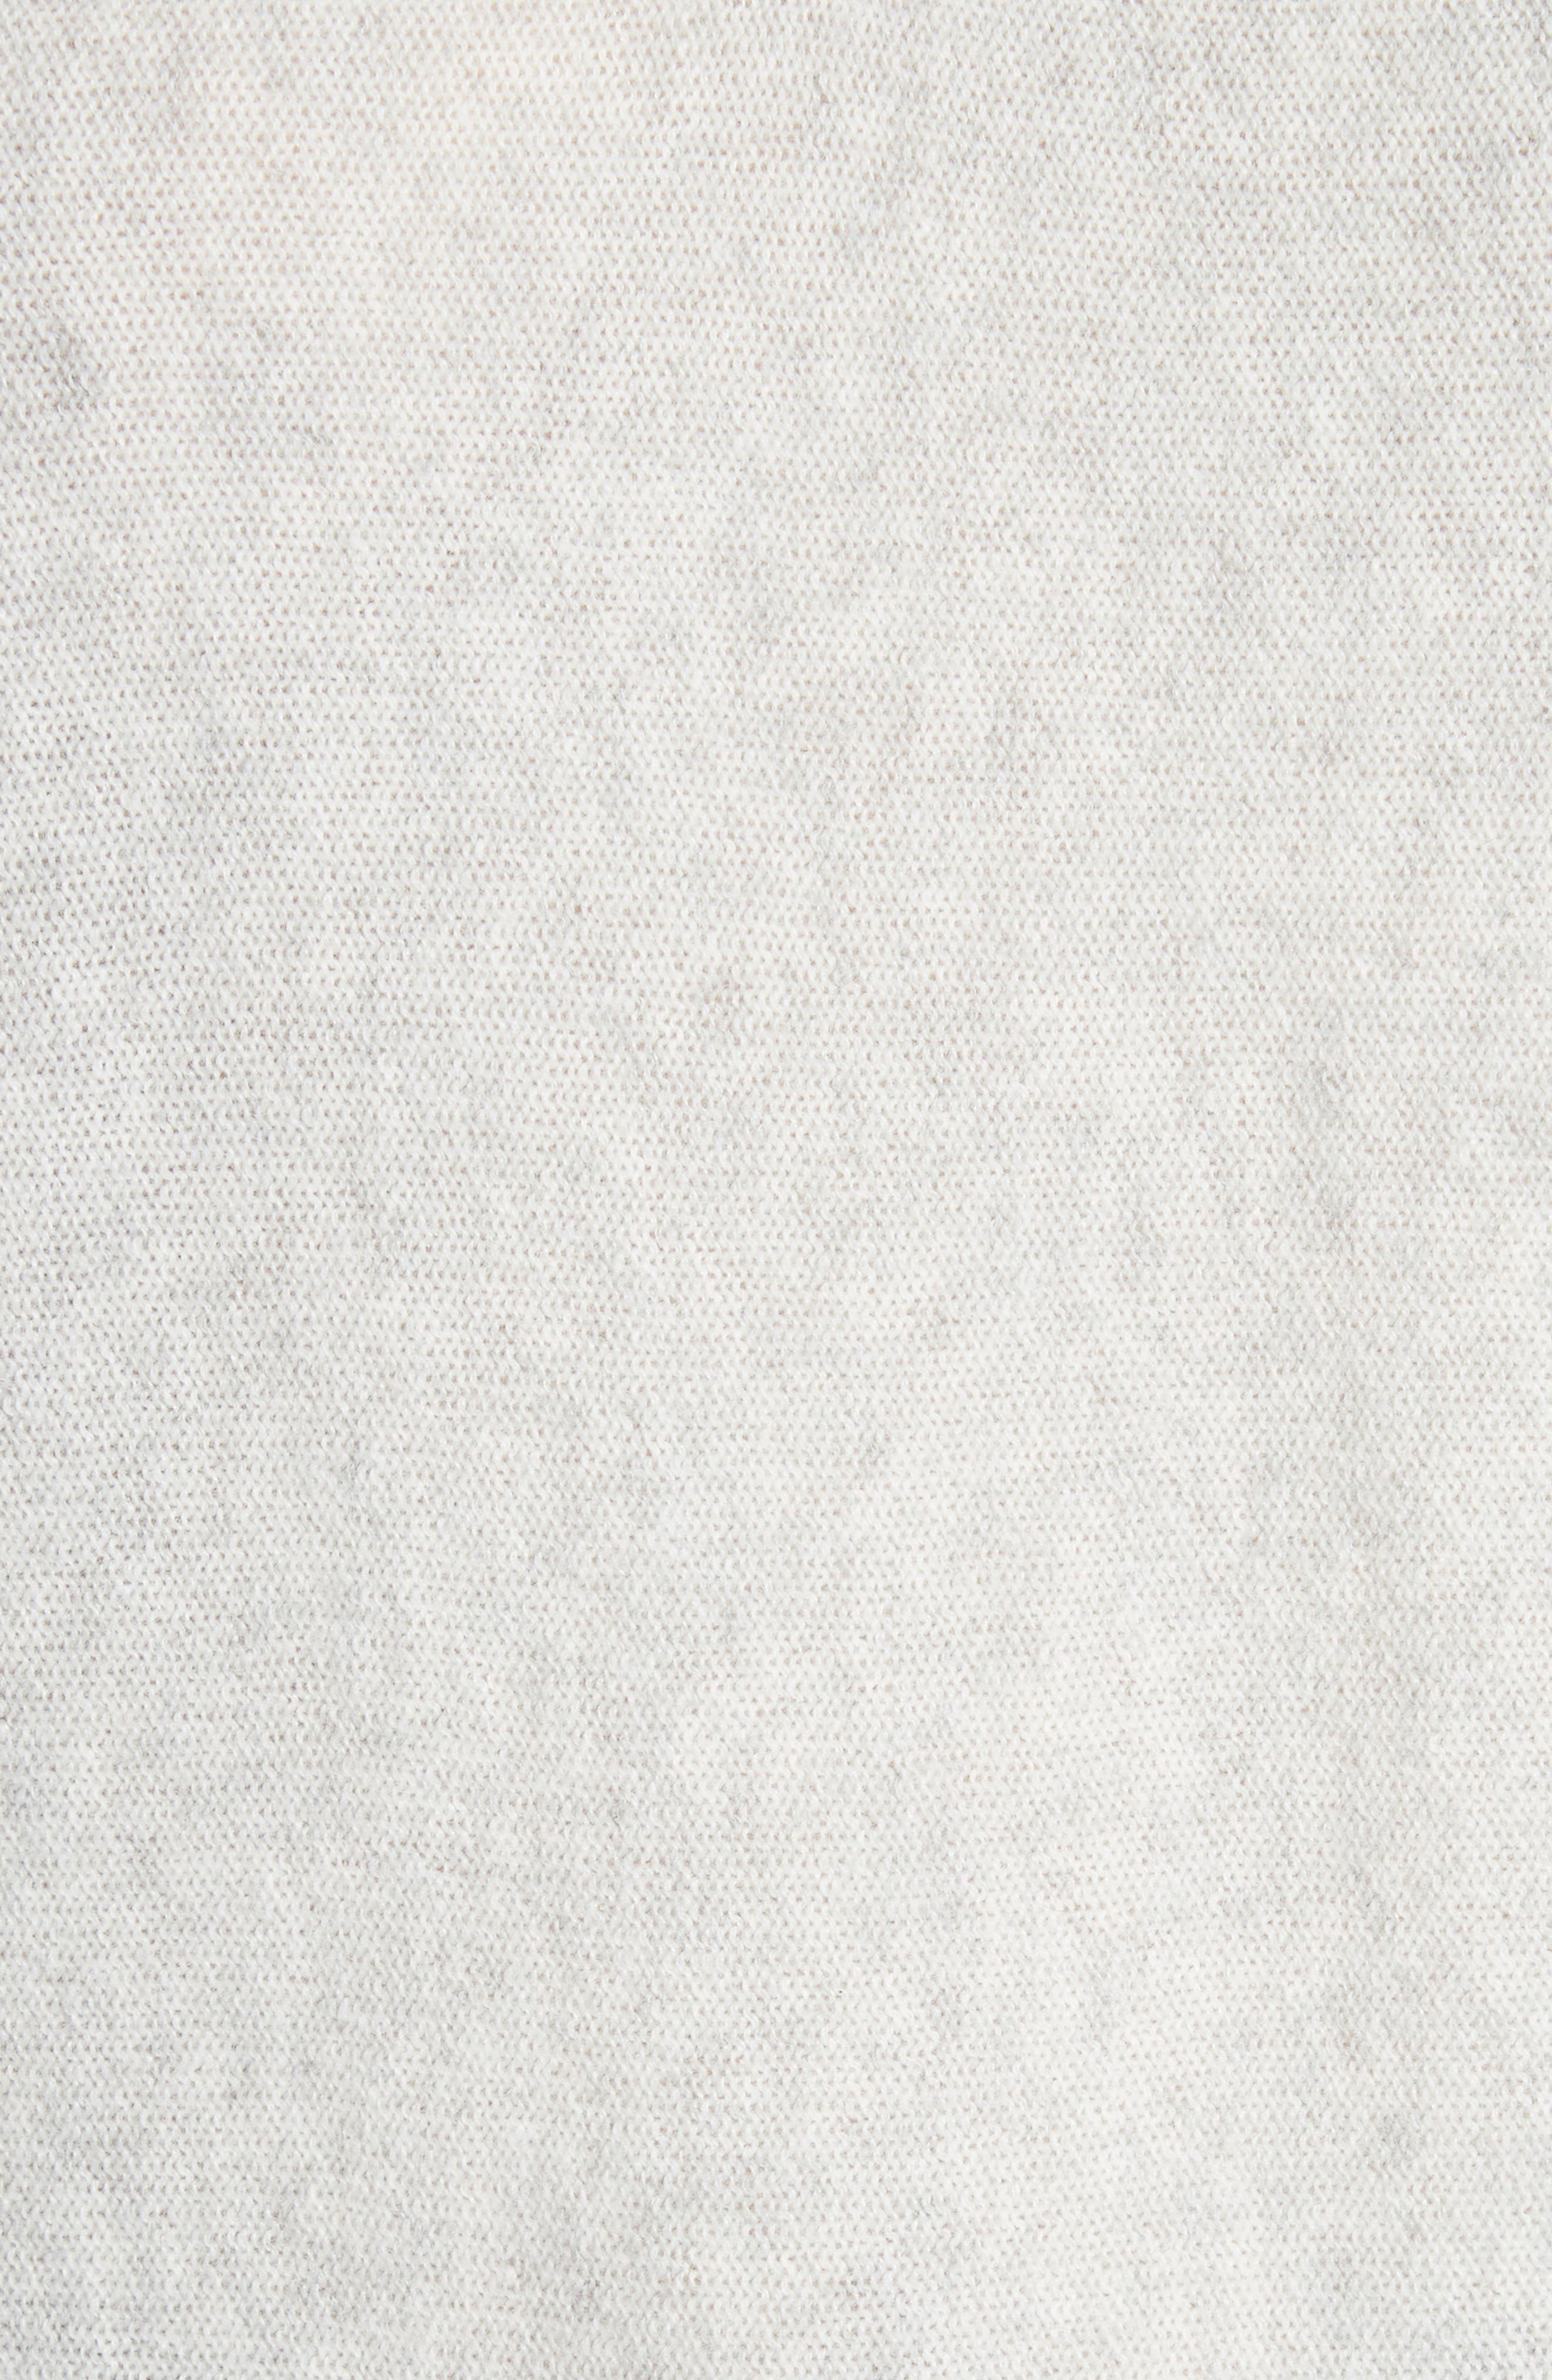 Weller Cashmere Sweater,                             Alternate thumbnail 5, color,                             100